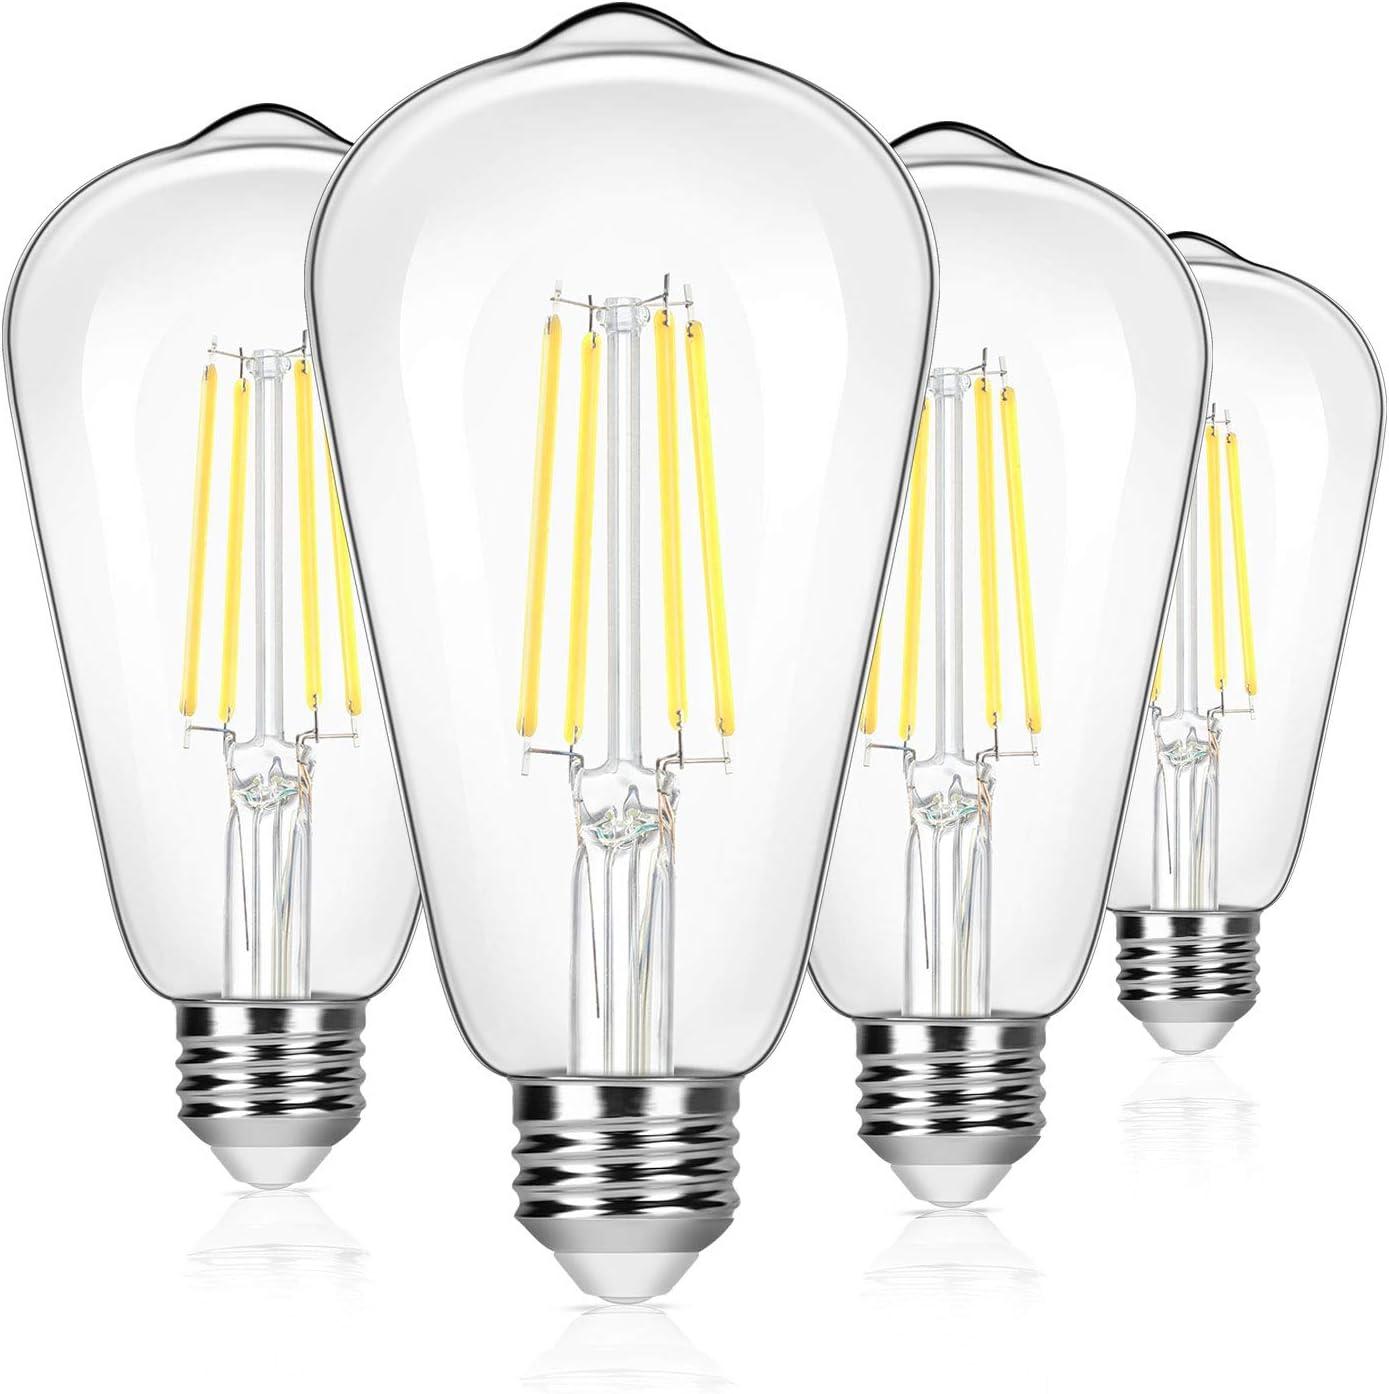 4-Pack Vintage 8W ST64 LED Edison 1 Bulbs Popular popular Light Equivalent 100W Max 77% OFF